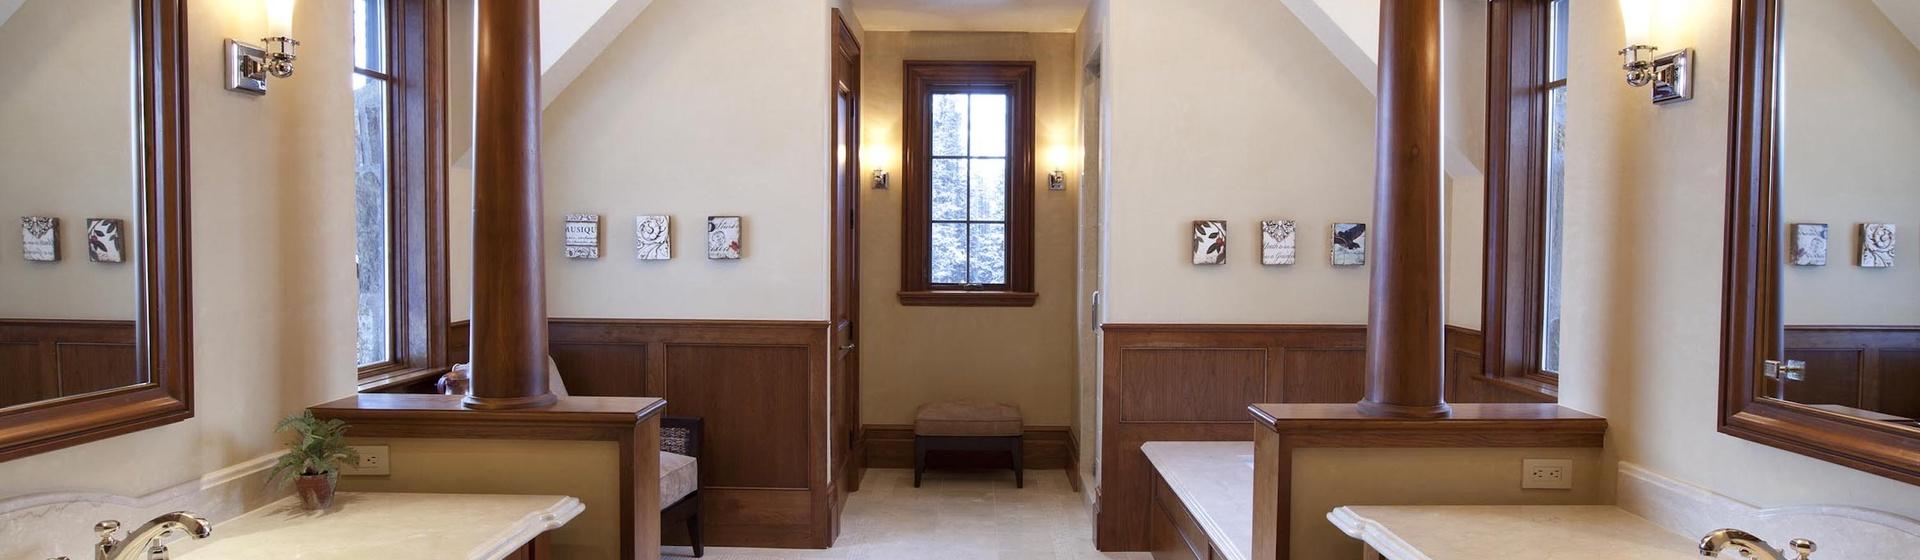 5.06-mountain-village-hood-park-master-bedroom-a-bathroom-3-track.jpg